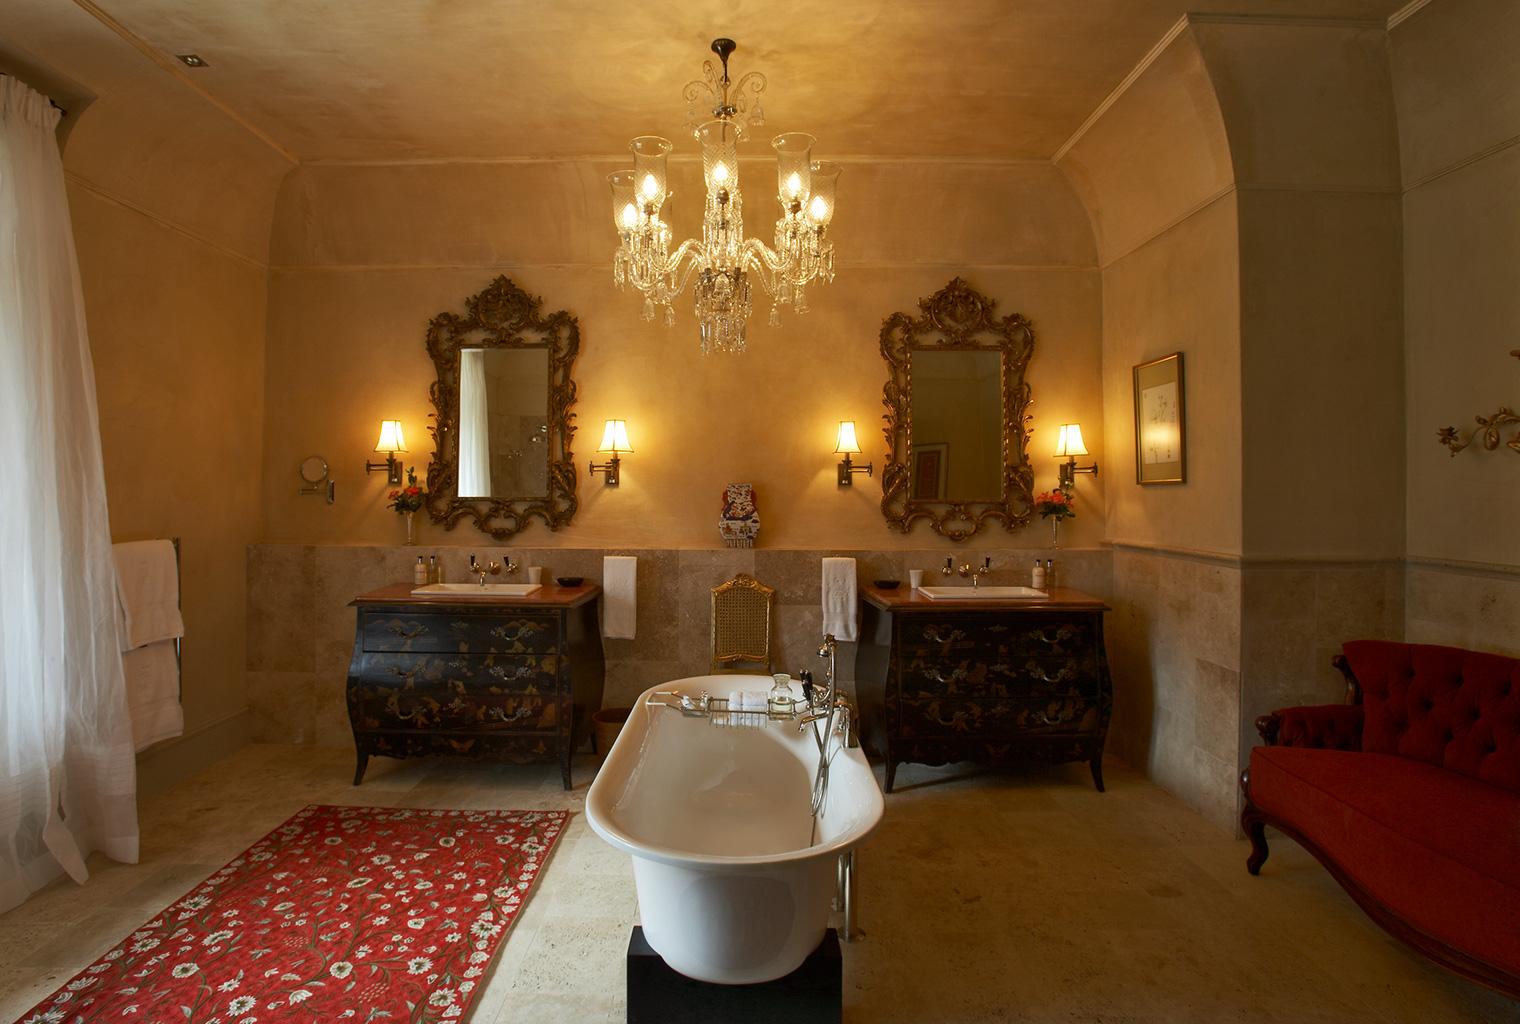 South-Africa, Winelands, La Residenc, Bathroom